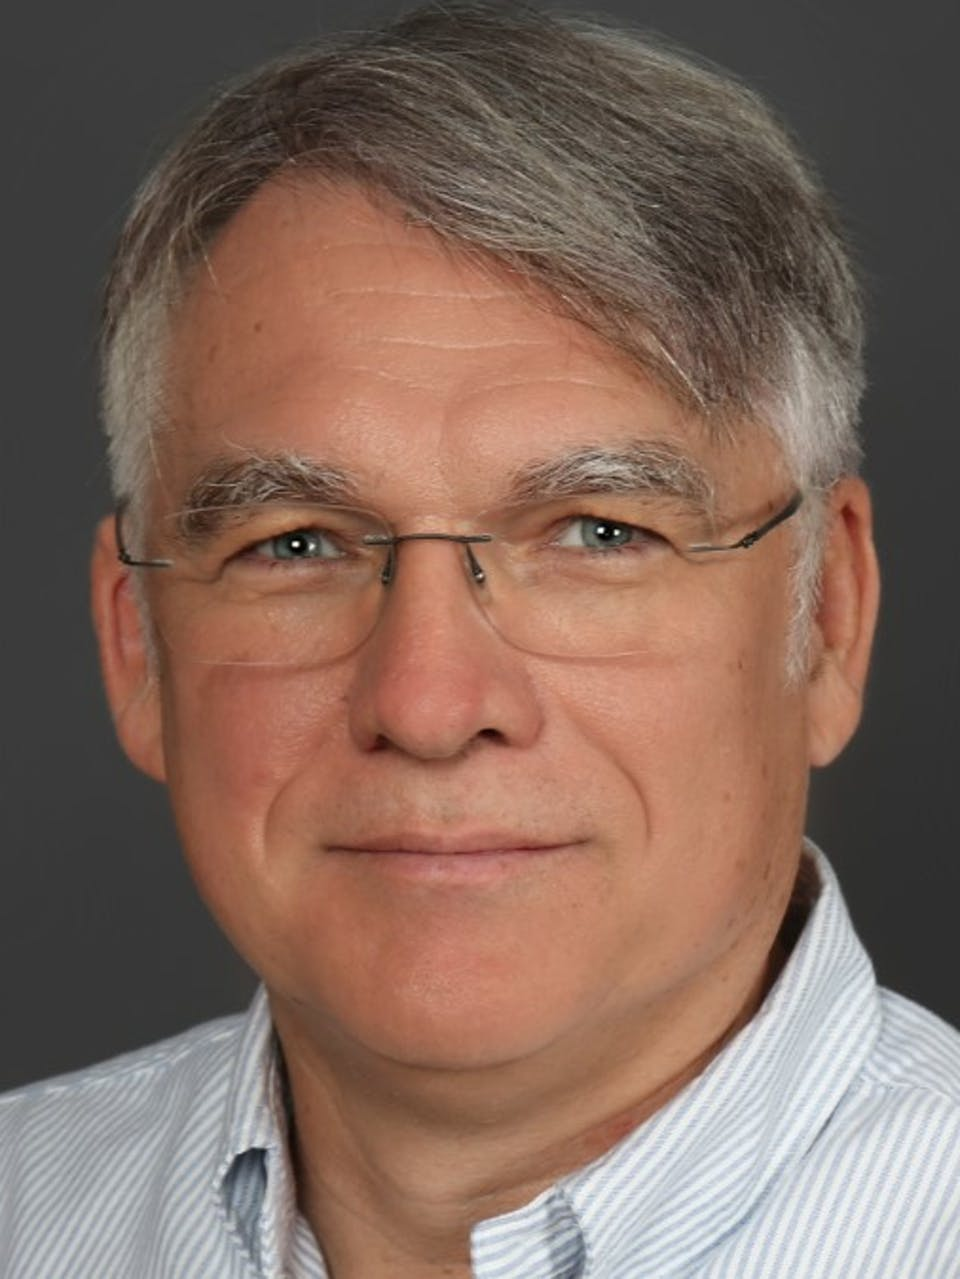 Kurt Siemers - Siemens Energy